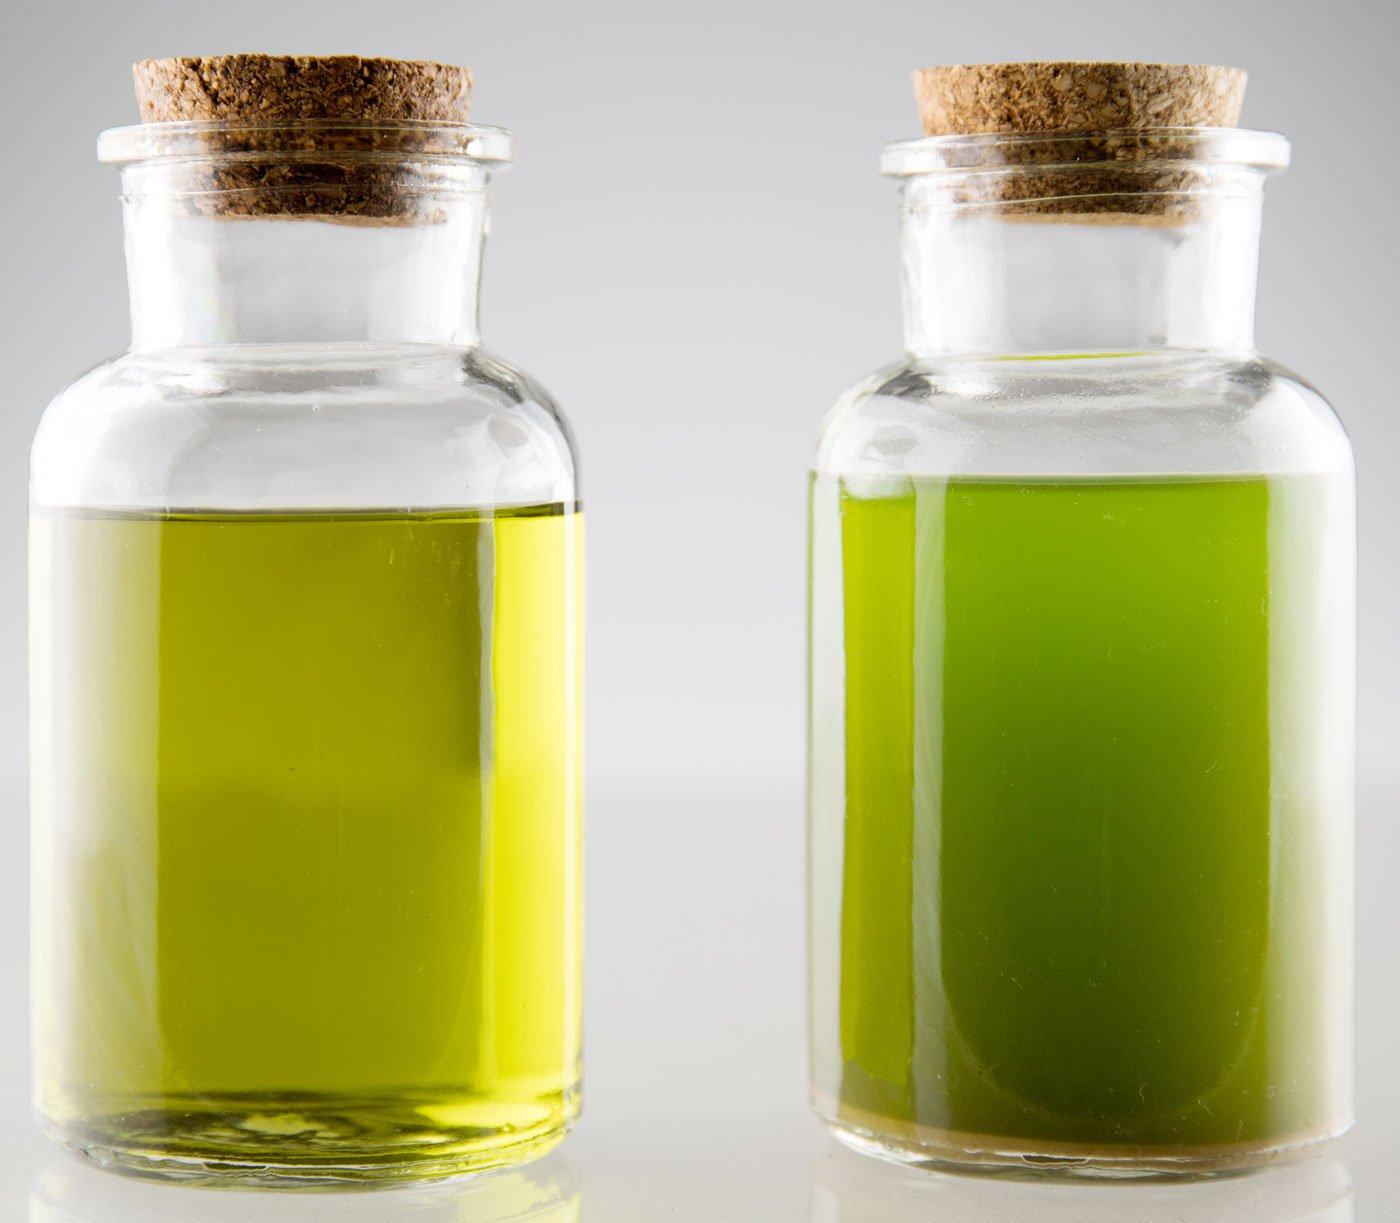 Co2 Ethanol